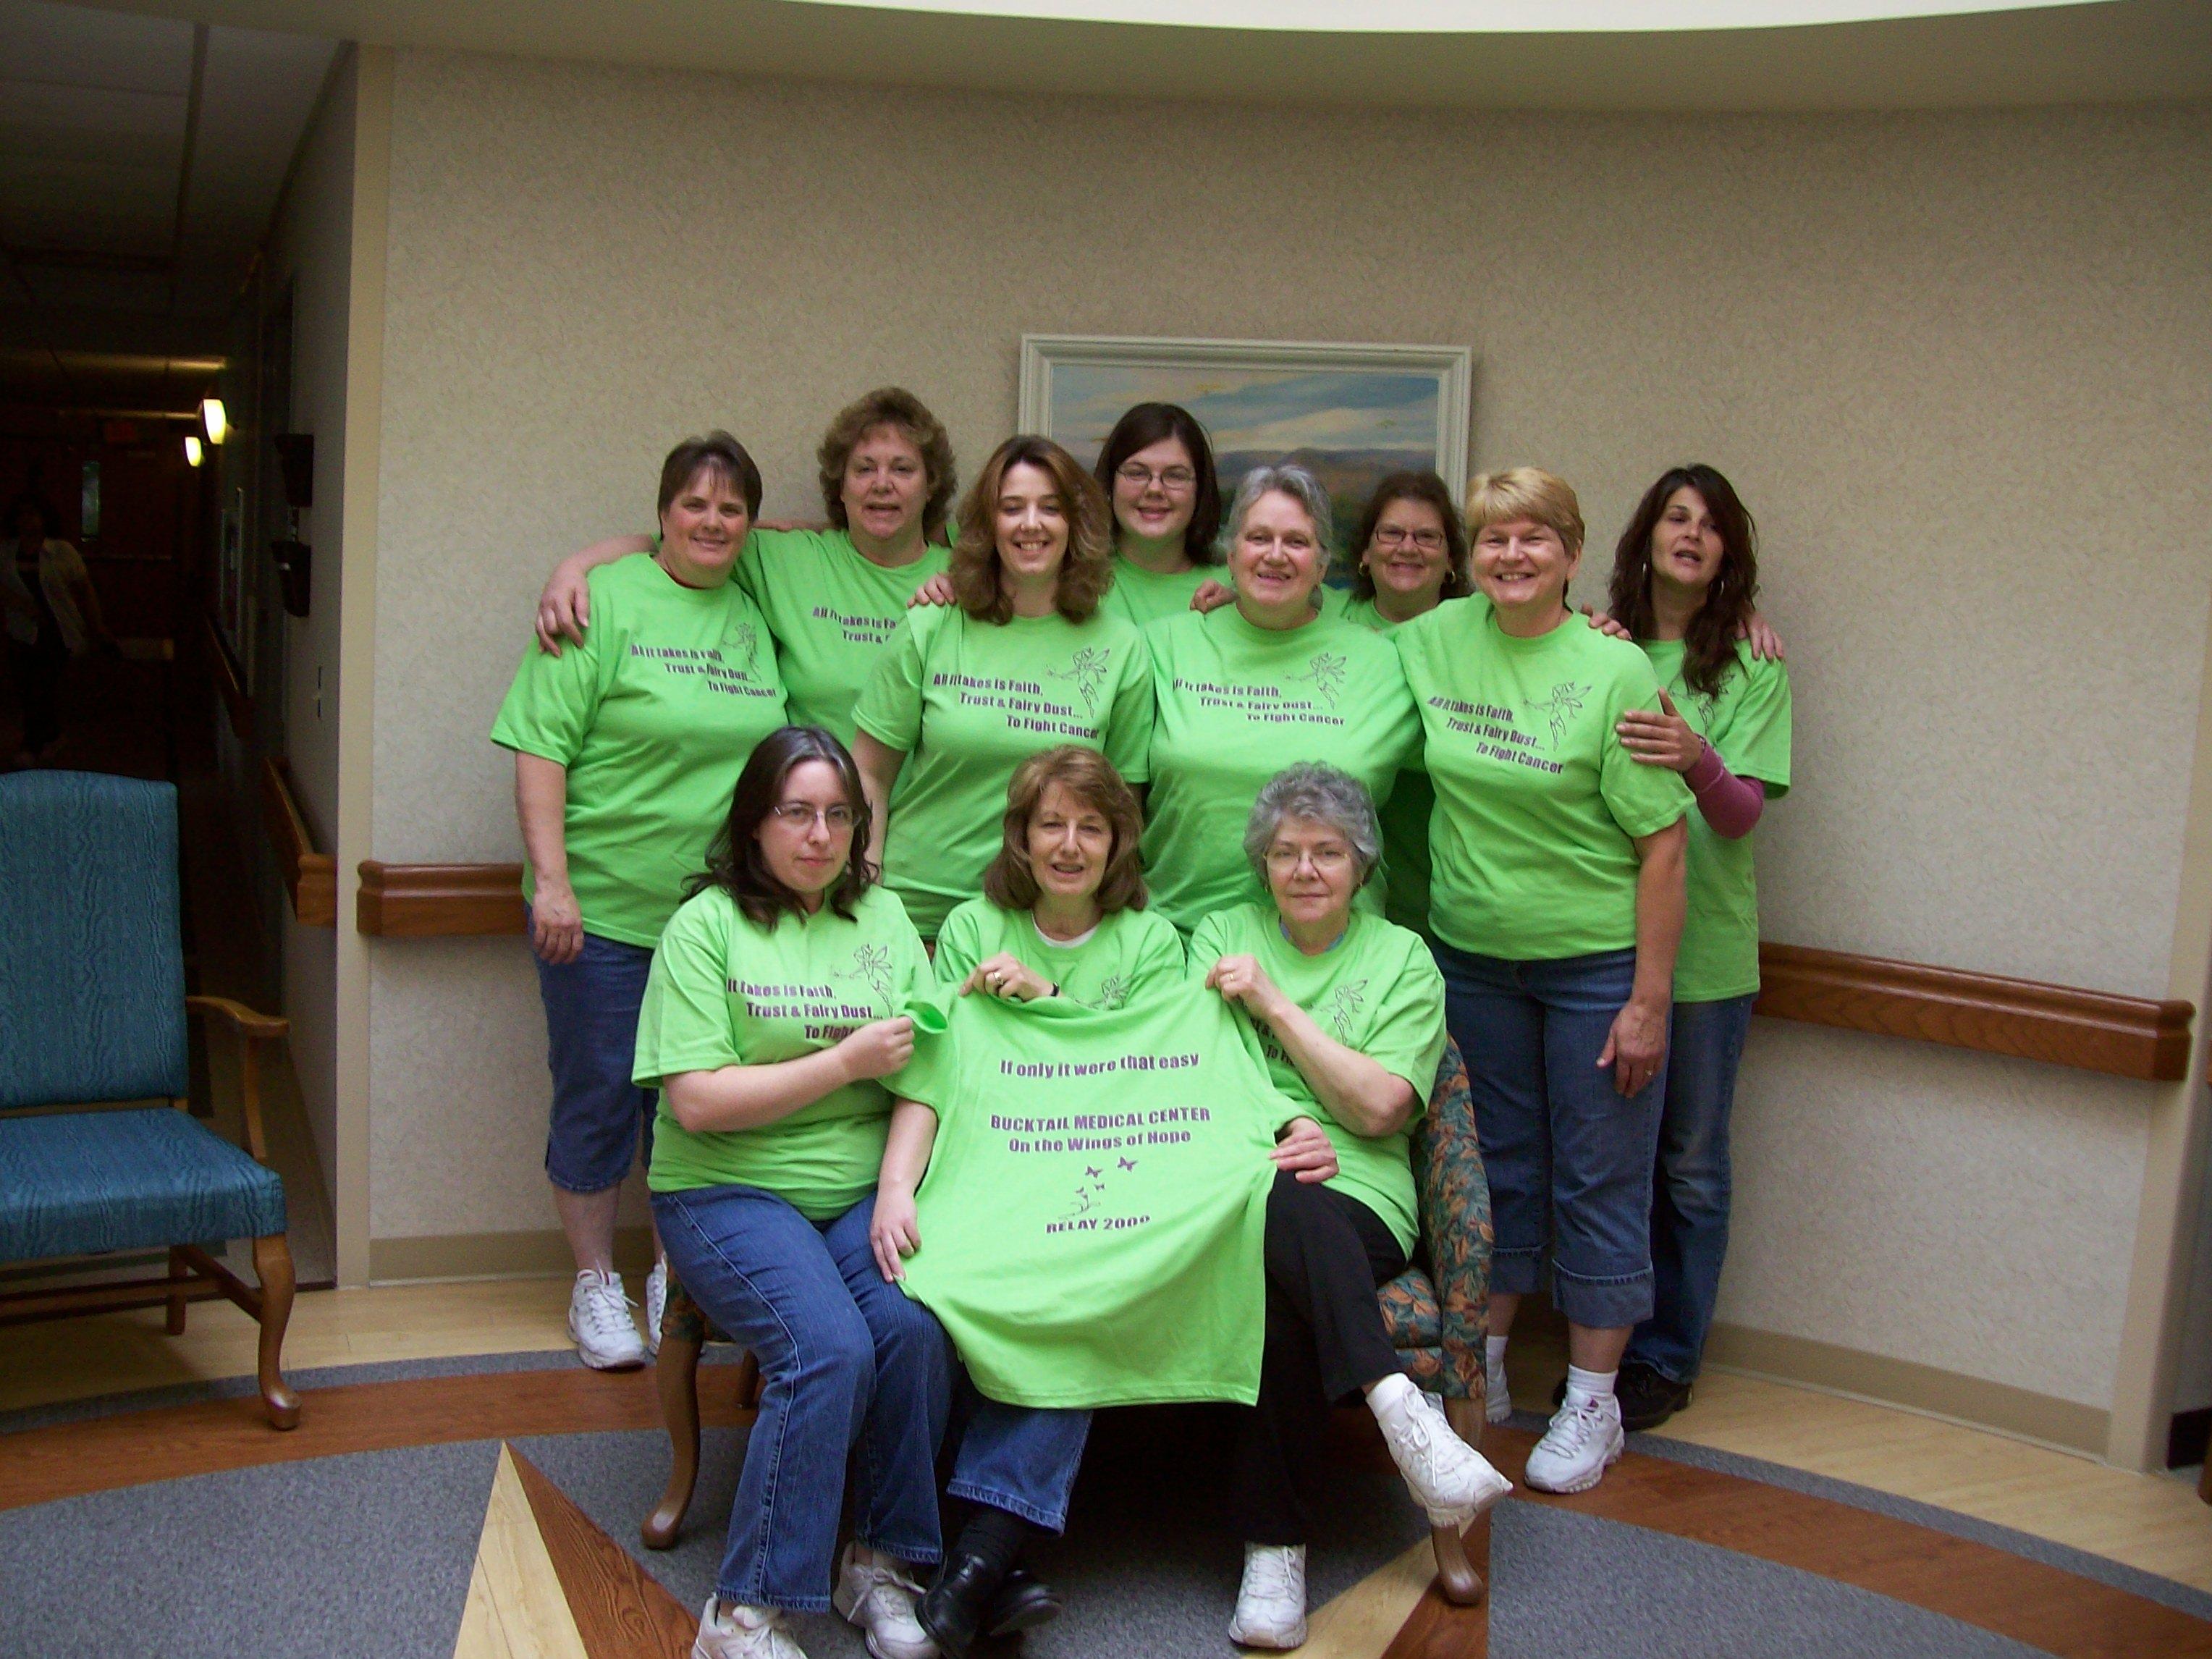 Design your own t-shirt gildan - Bmc S Sub Lime Relay Team T Shirt Photo